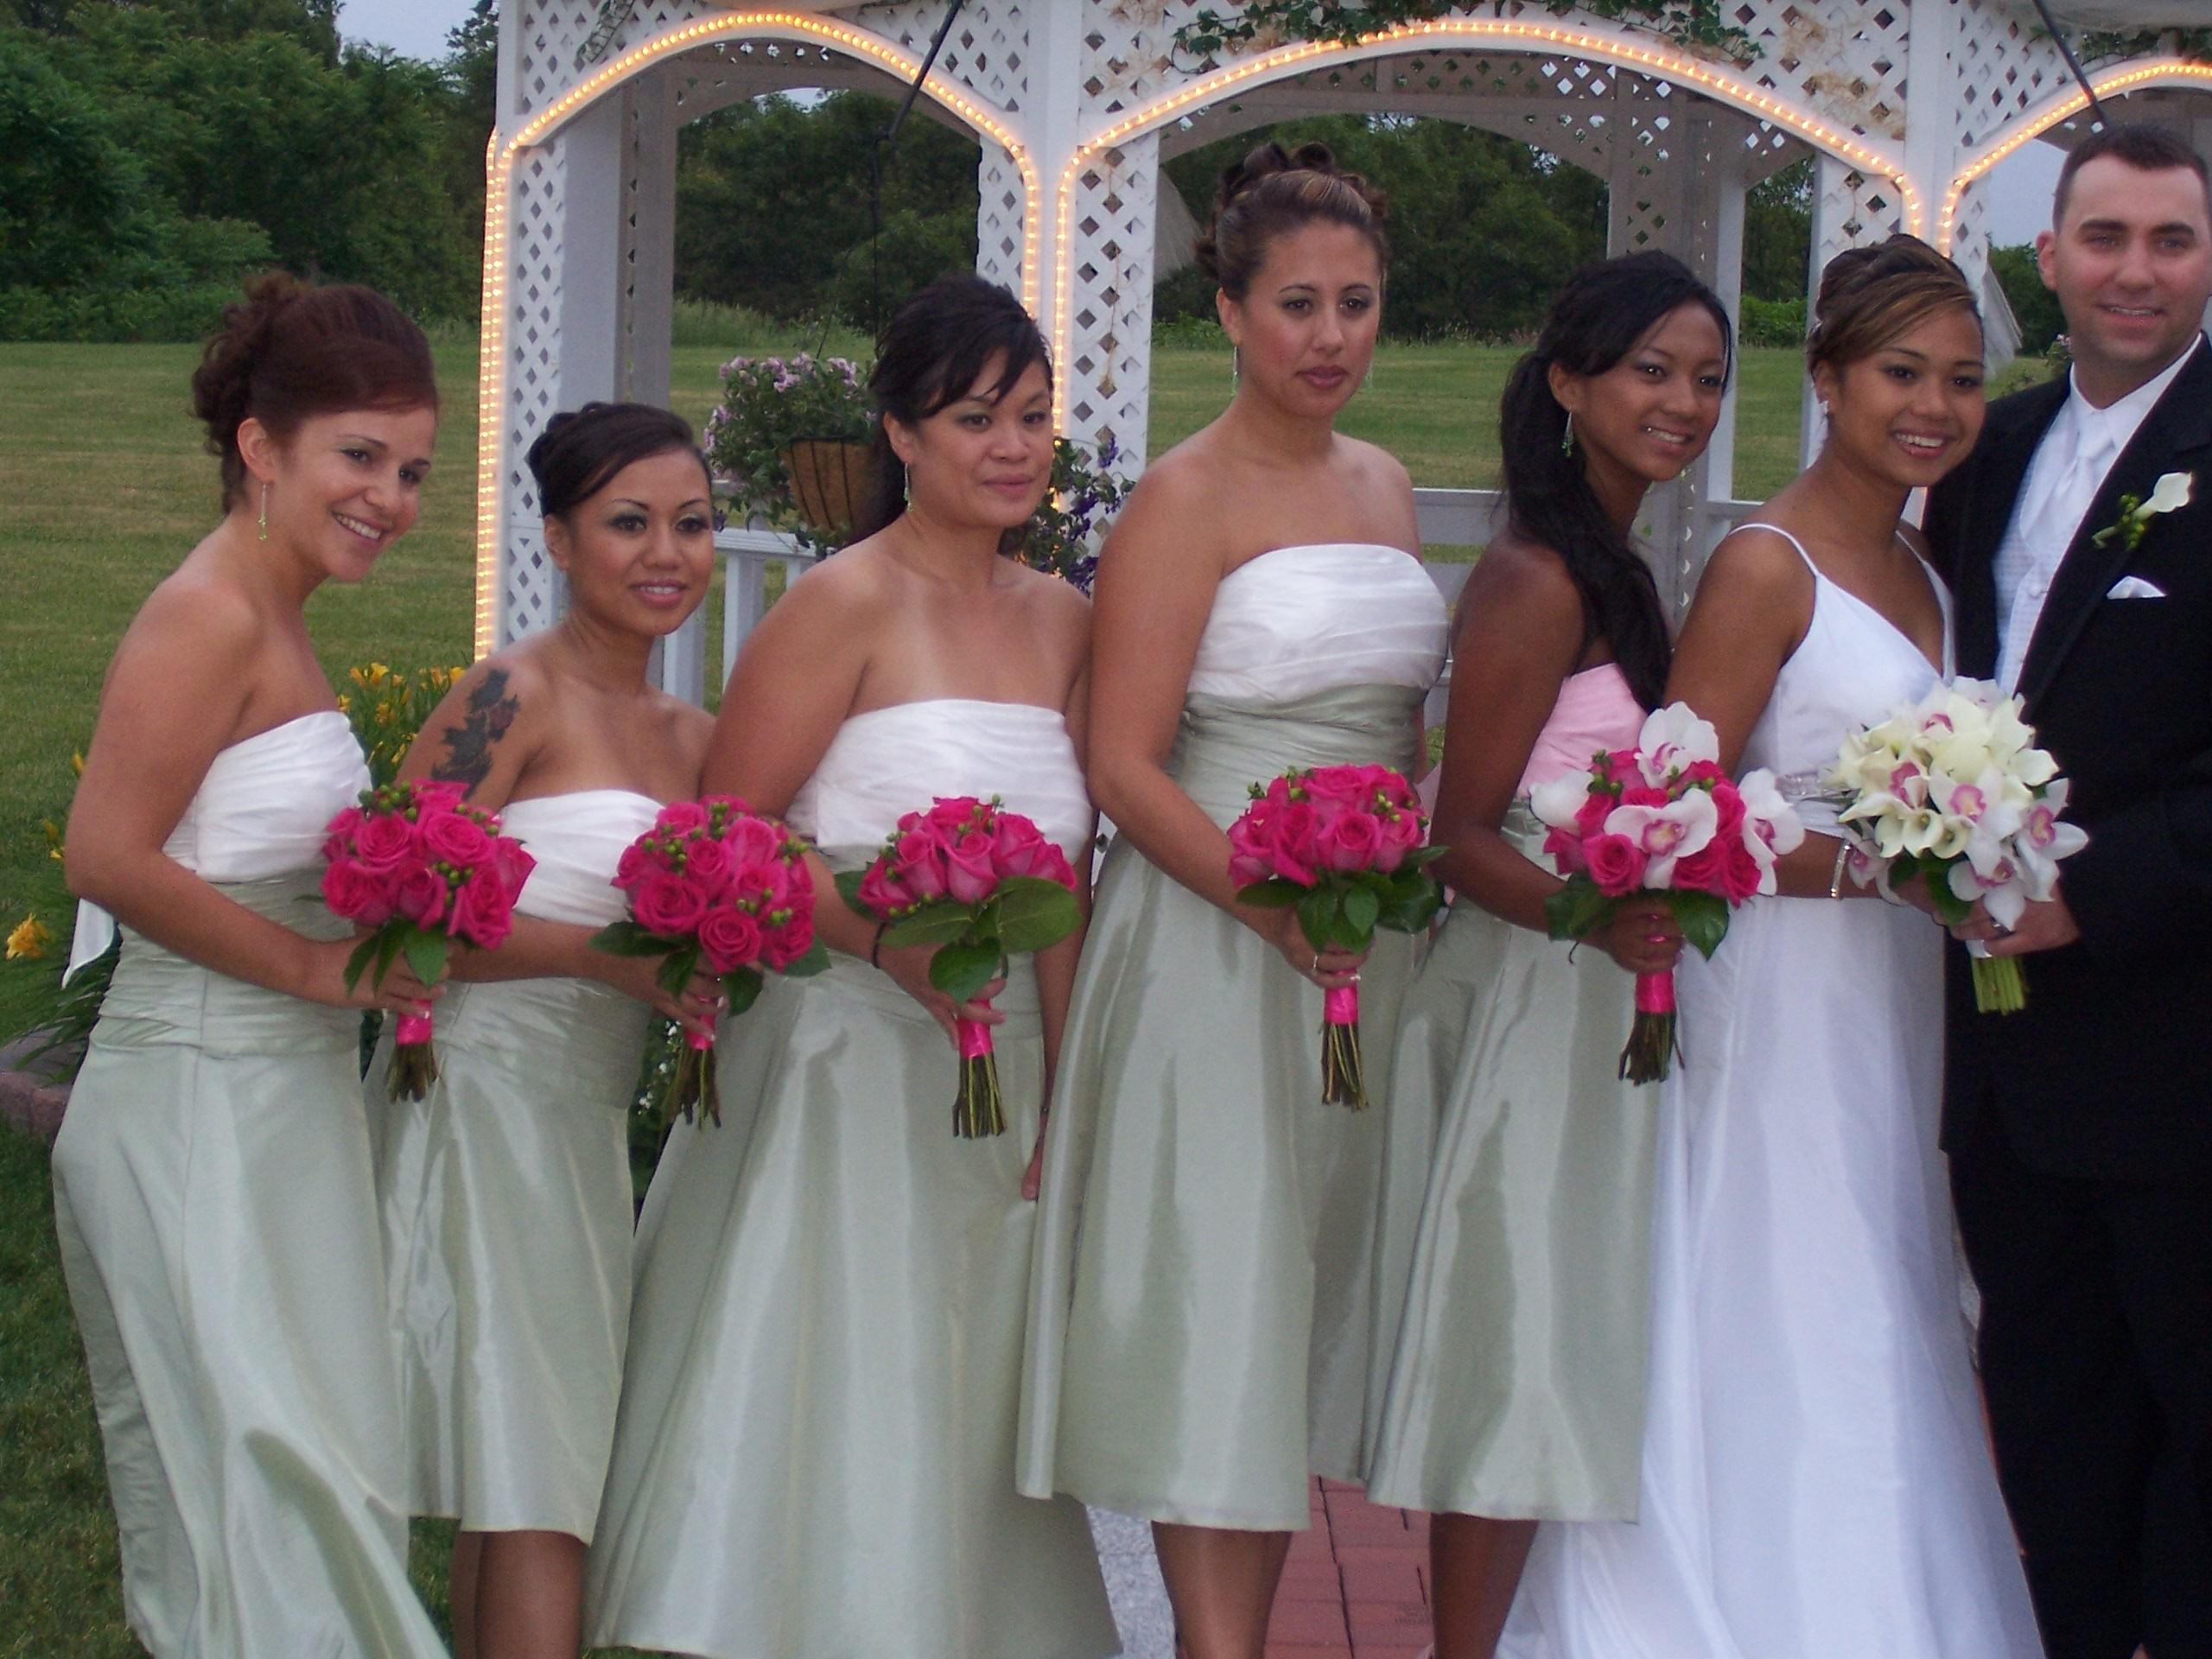 Flowers & Decor, Wedding Dresses, Shoes, Fashion, dress, Bride Bouquets, Bride, Flowers, Bridemaids, Dj, Ra-mu and the crew, Flower Wedding Dresses